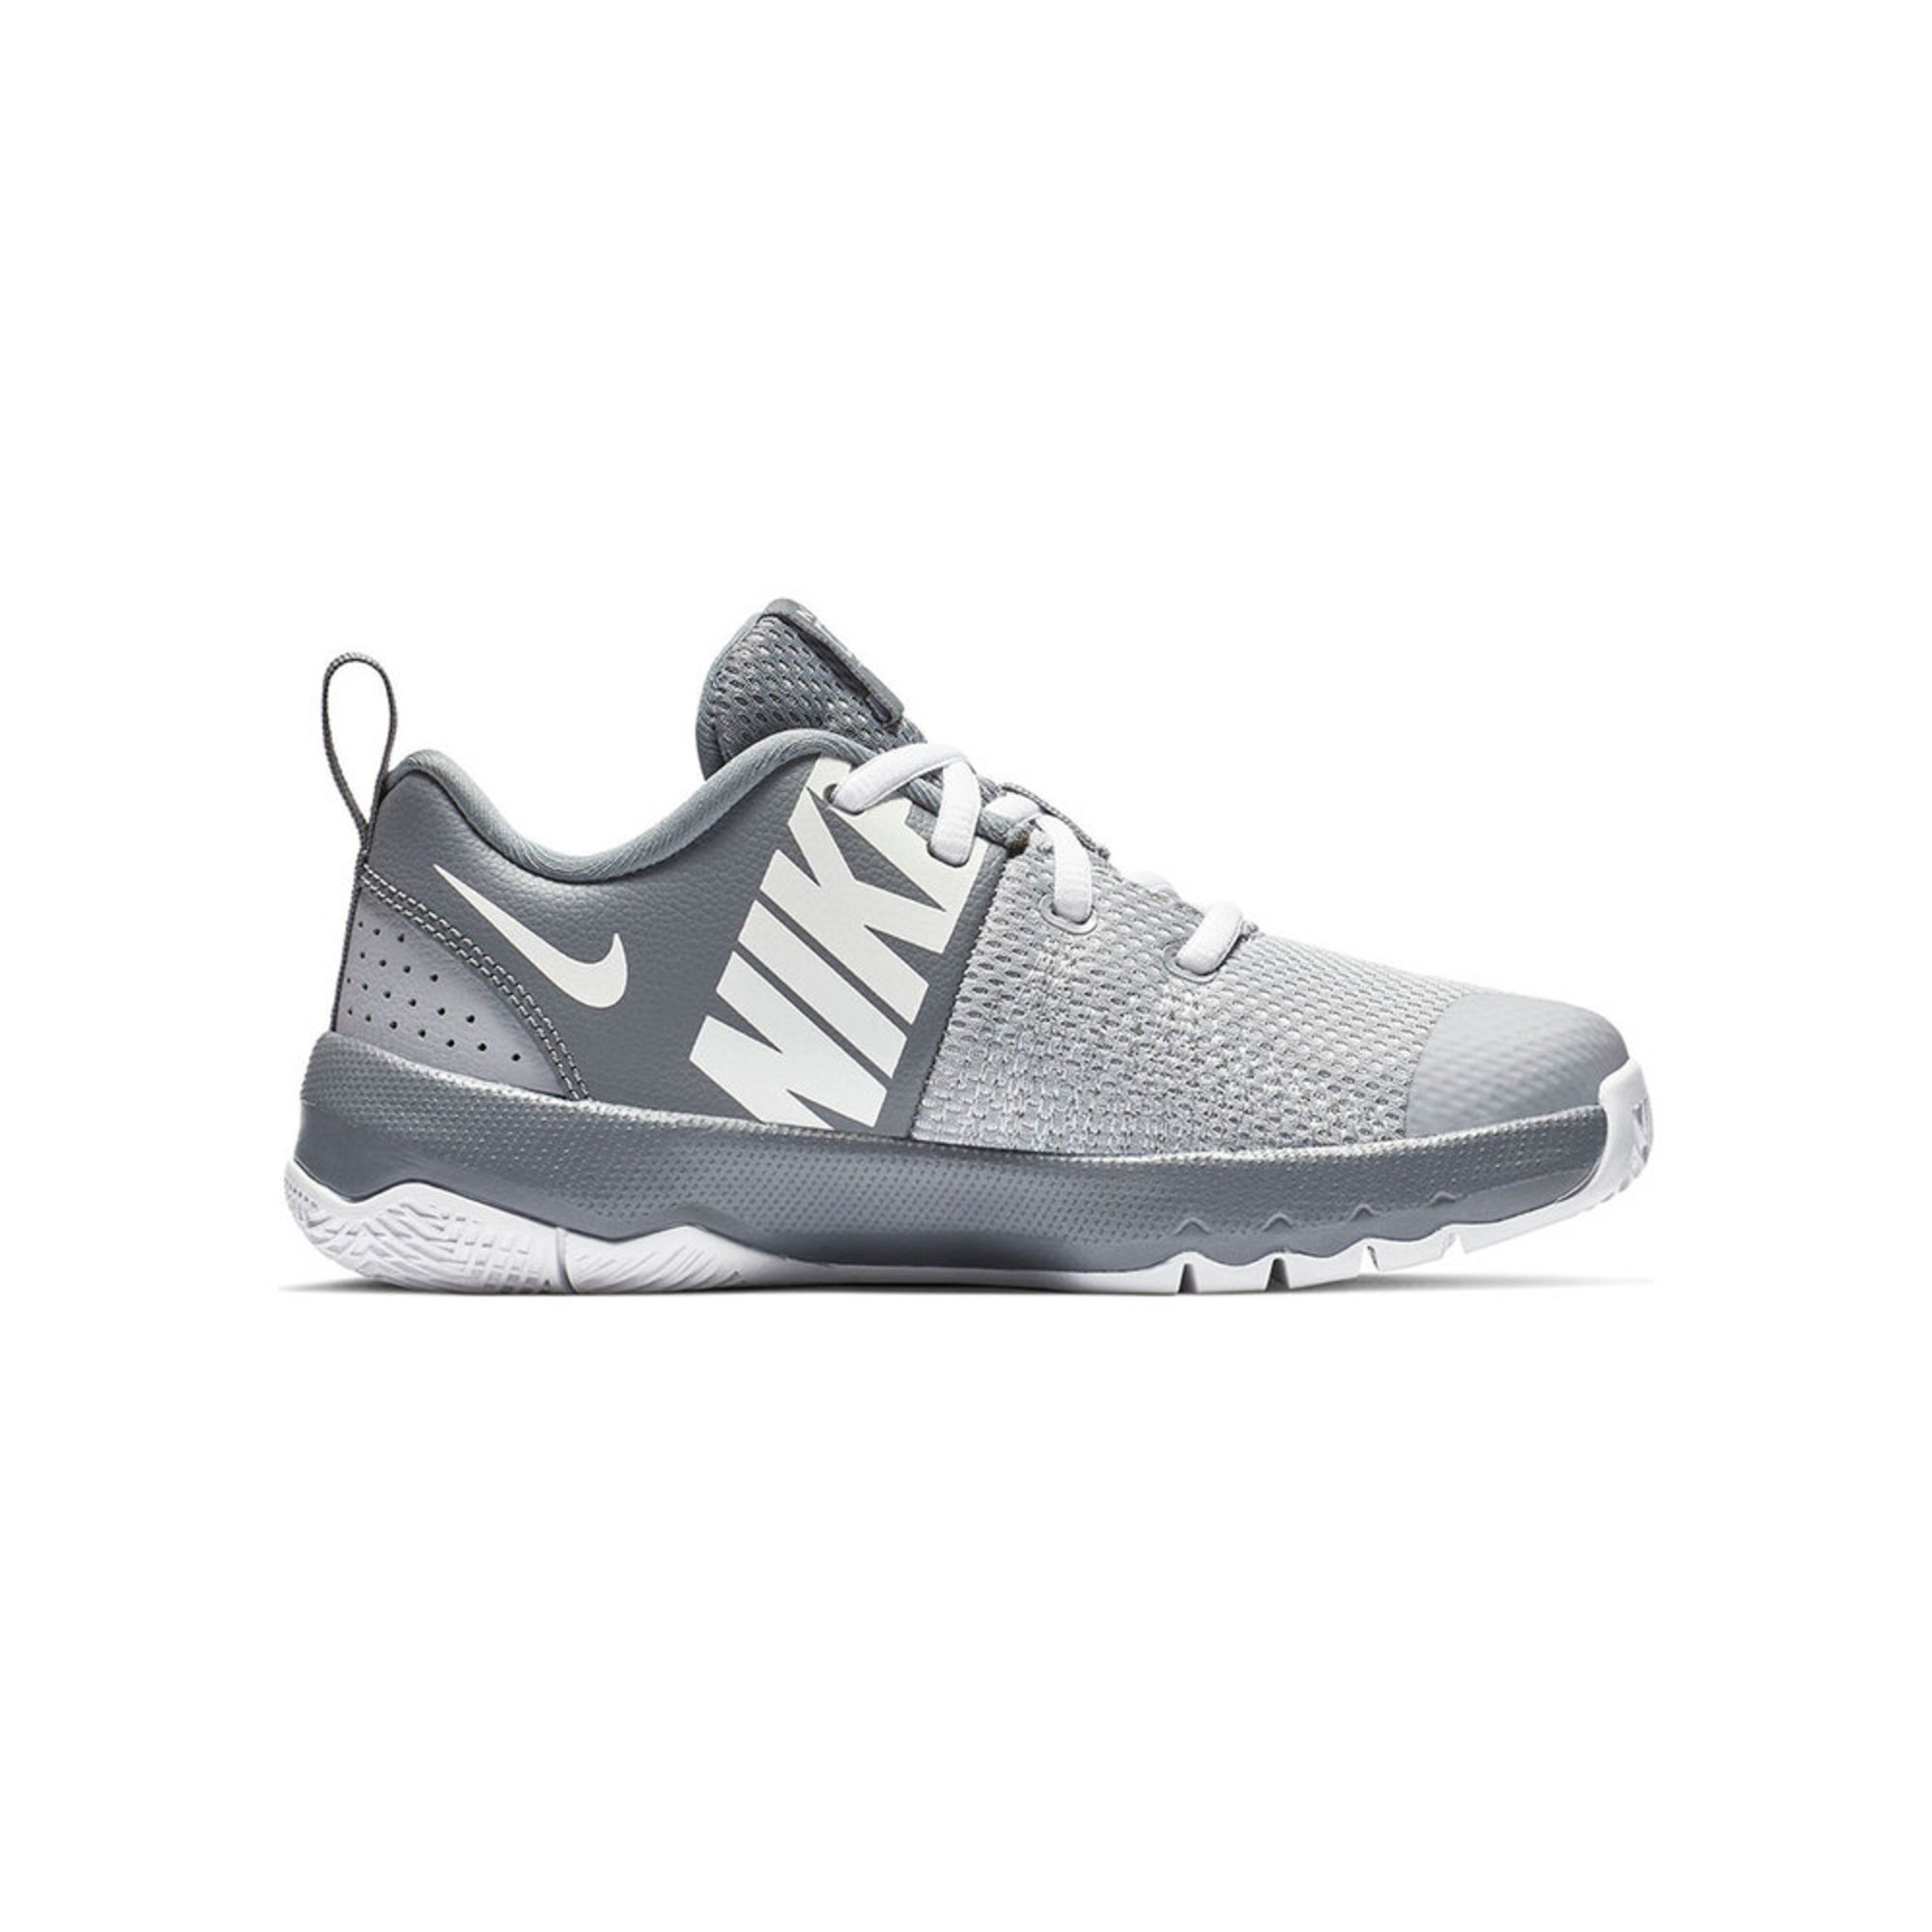 3f431dc7ede2d Nike Boys Team Hustle Quick Basketball Shoe (little Kid) | Little ...